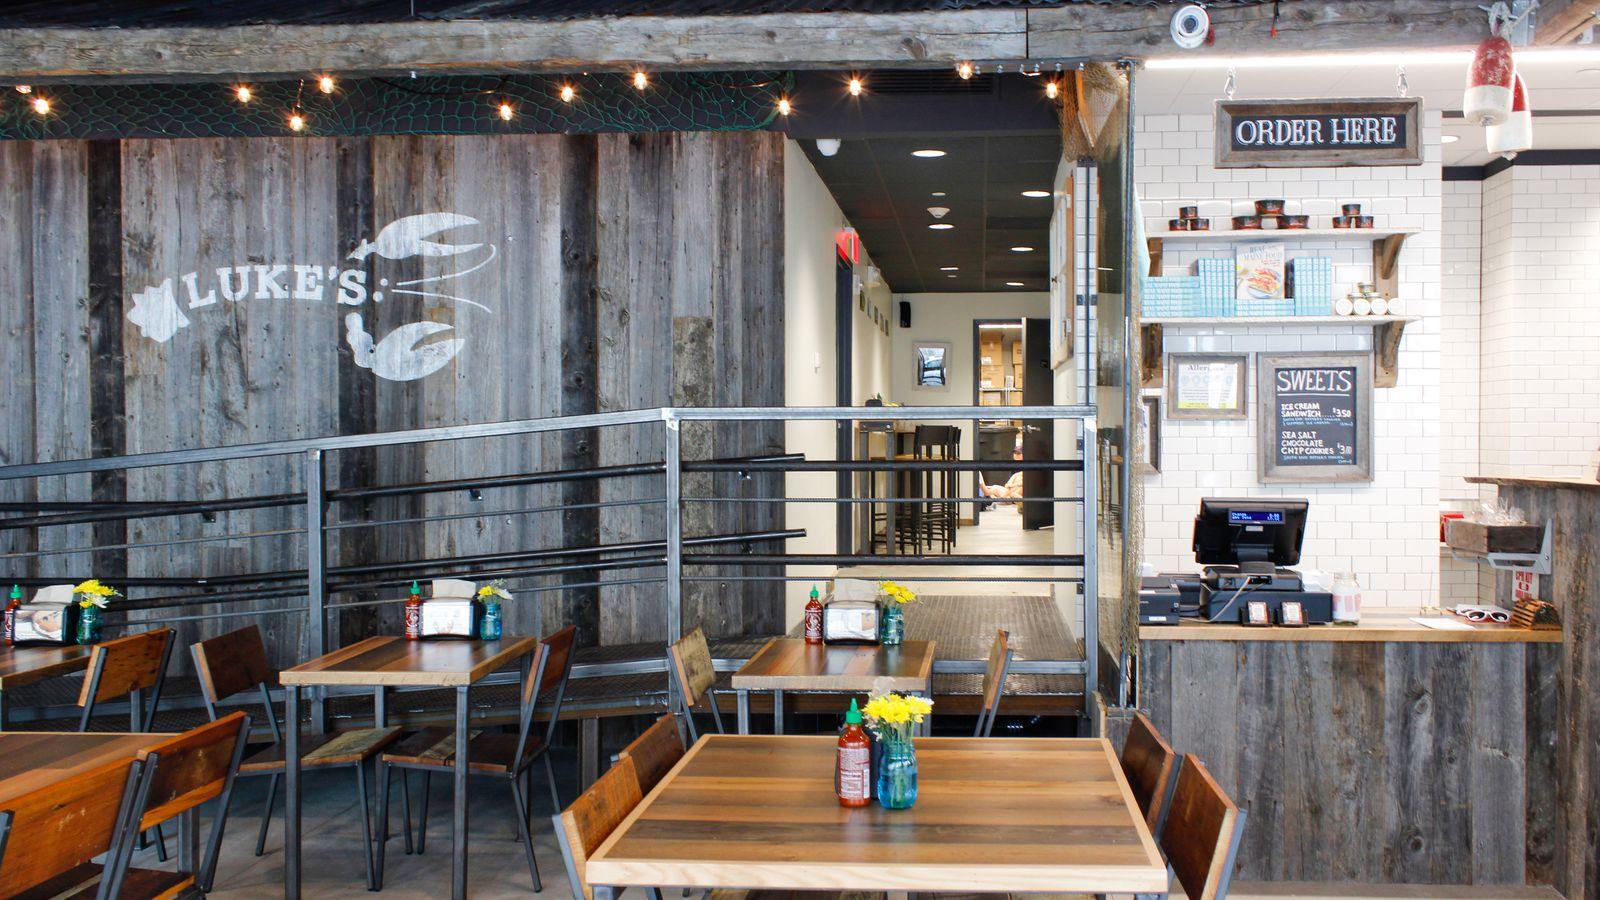 Take a Lobster Roll Break Tomorrow at the New Luke's Lobster - Eater Boston